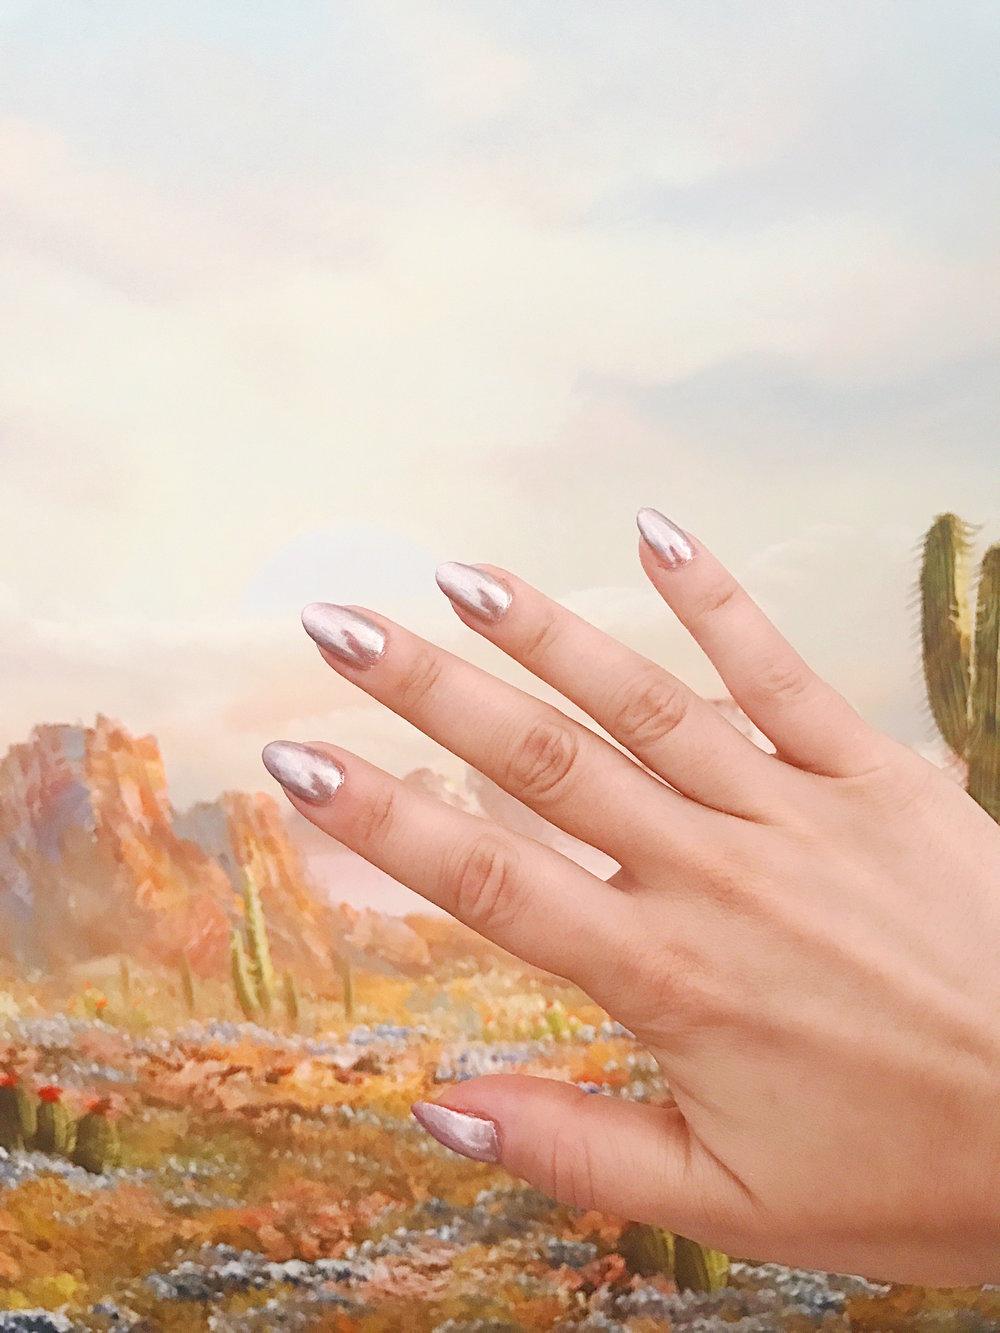 Chrome Manicure | Sunday Kind of Love | ARSENIC-LACE.COM